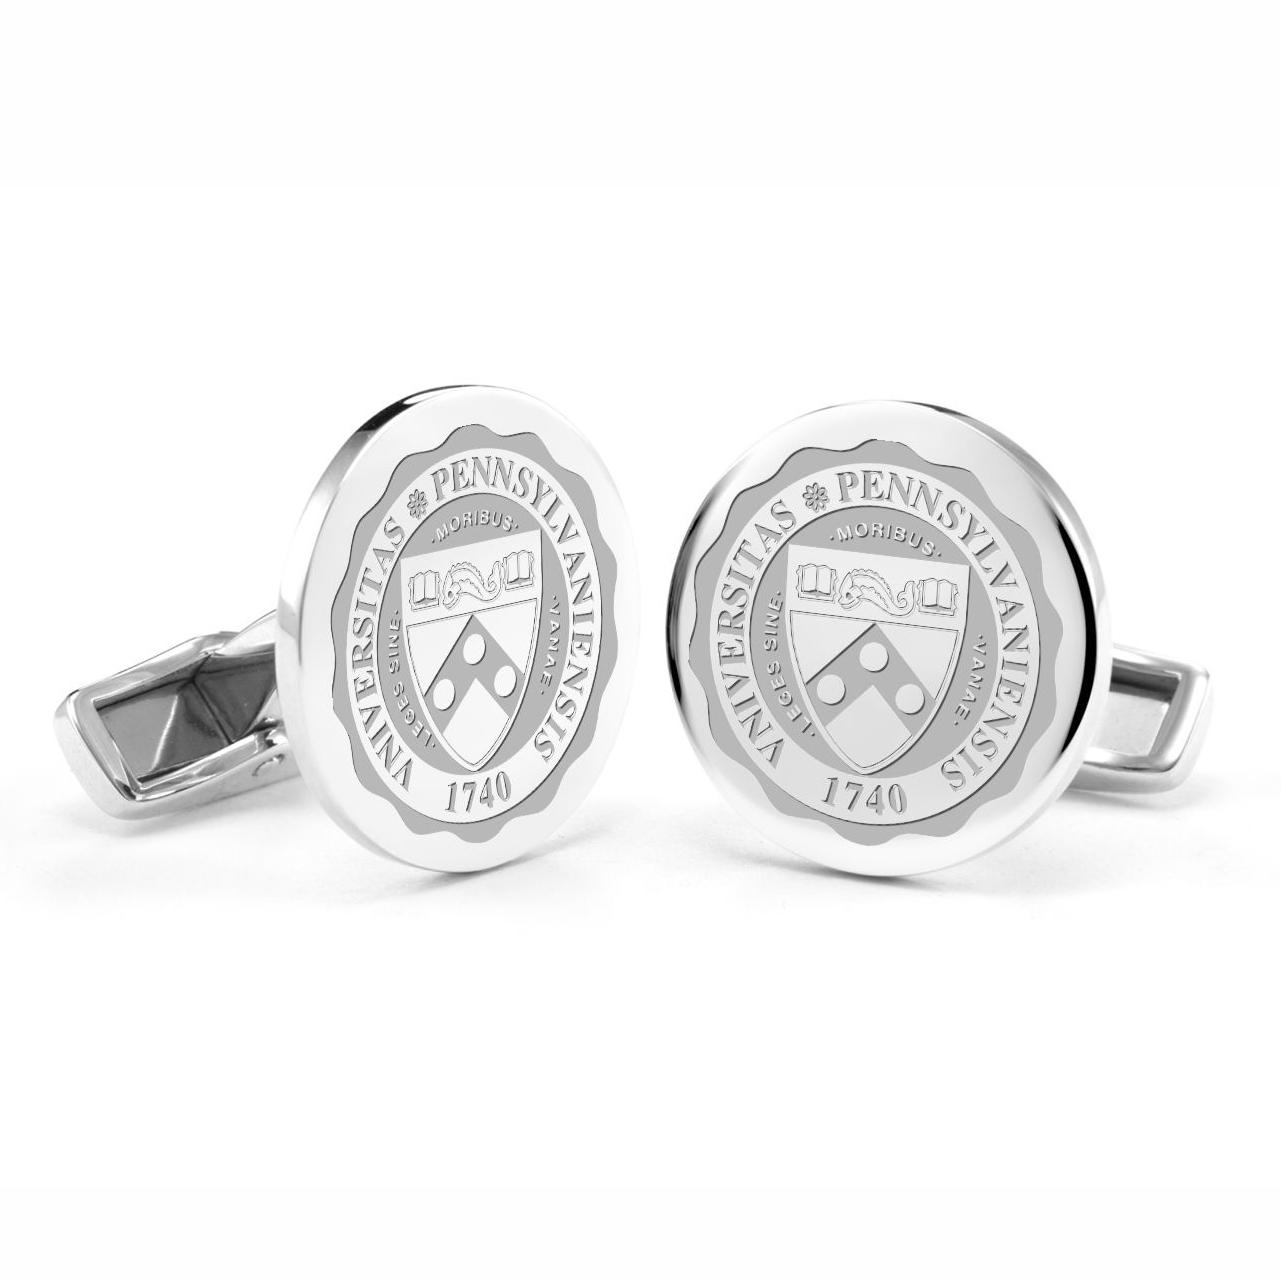 University of Pennsylvania Cufflinks in Sterling Silver